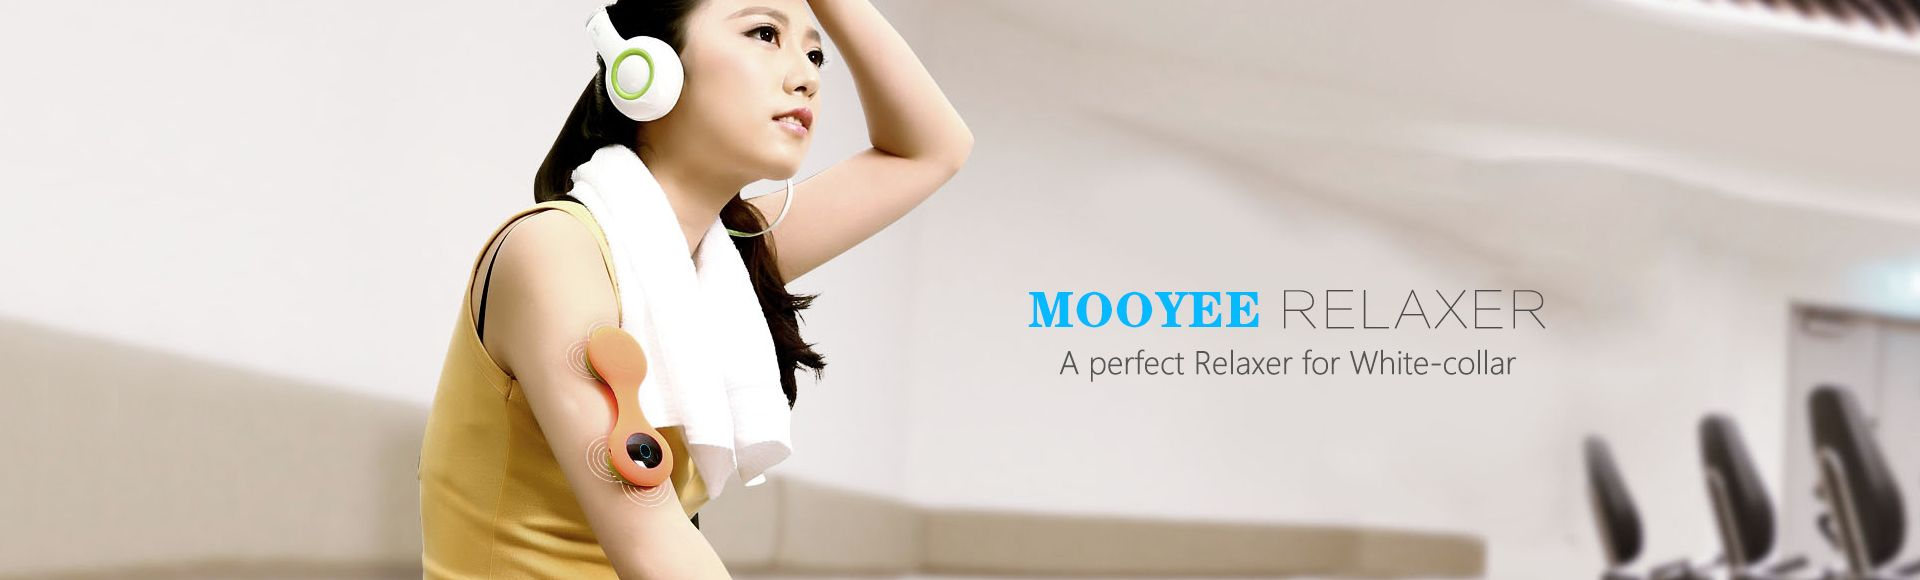 Mooyee Relaxer Back Neck Massager - Back Relaxer Smart Massager Relax your neck